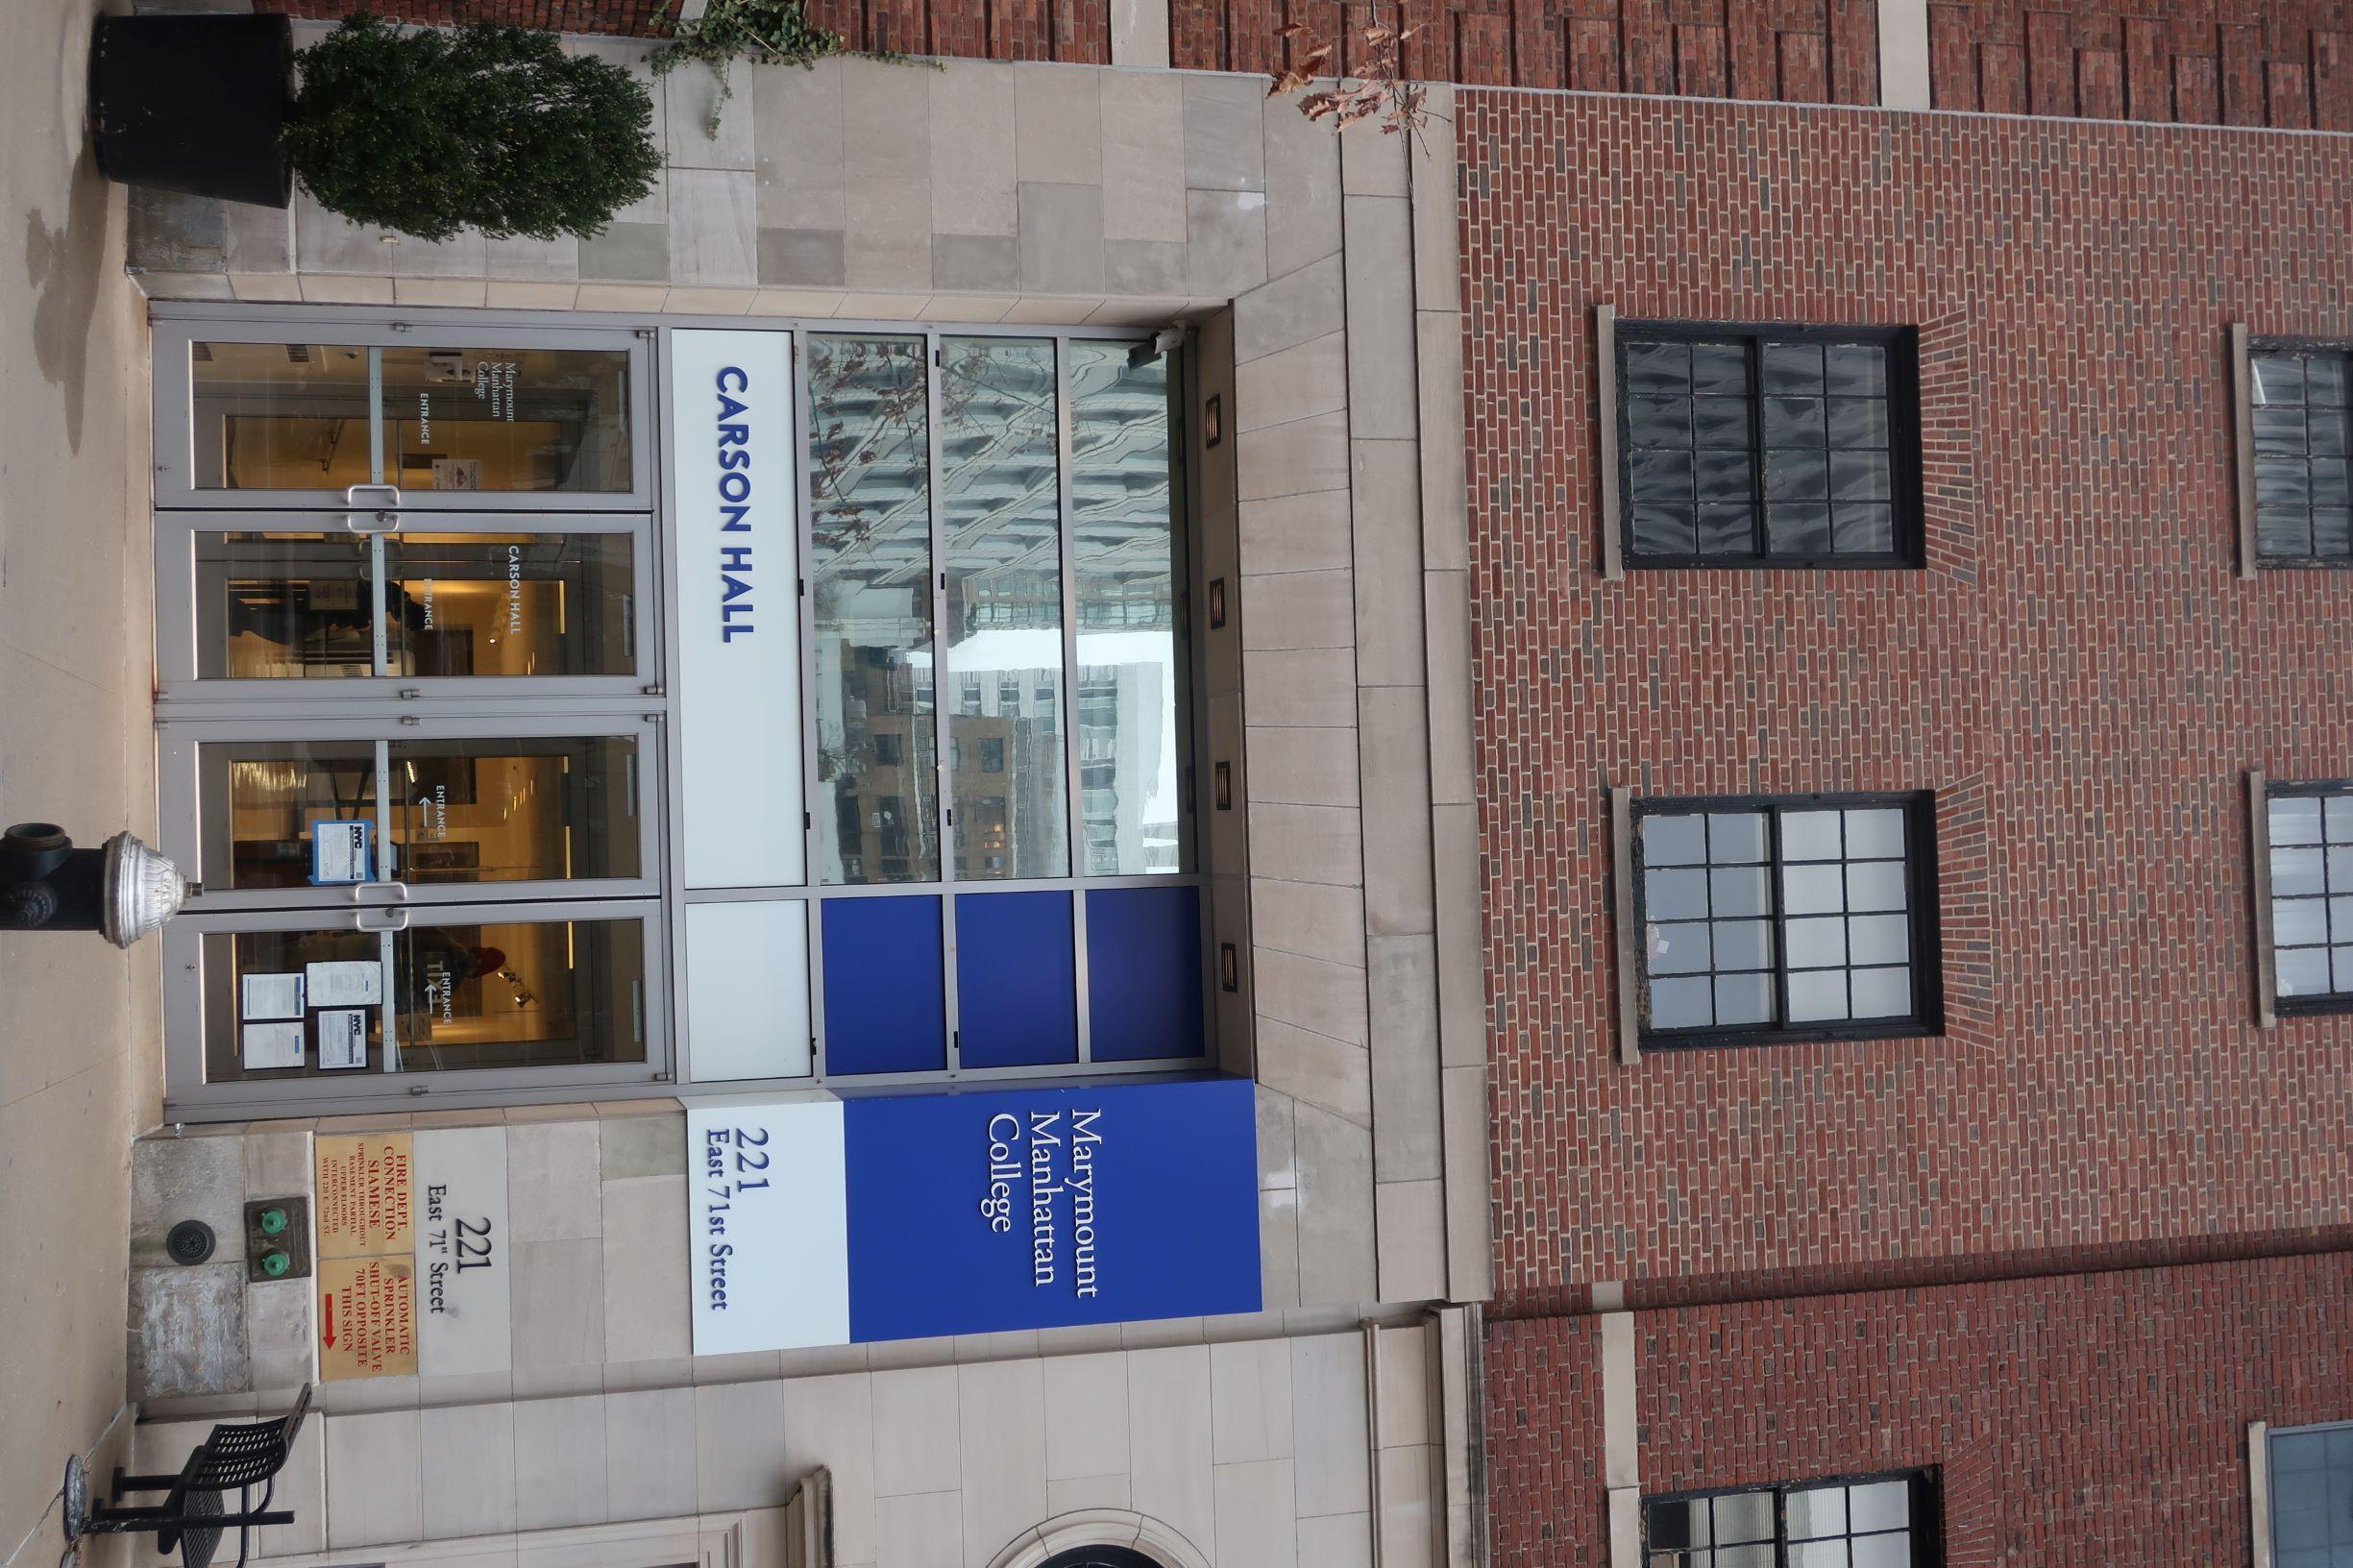 Marymount Manhattan College entrance